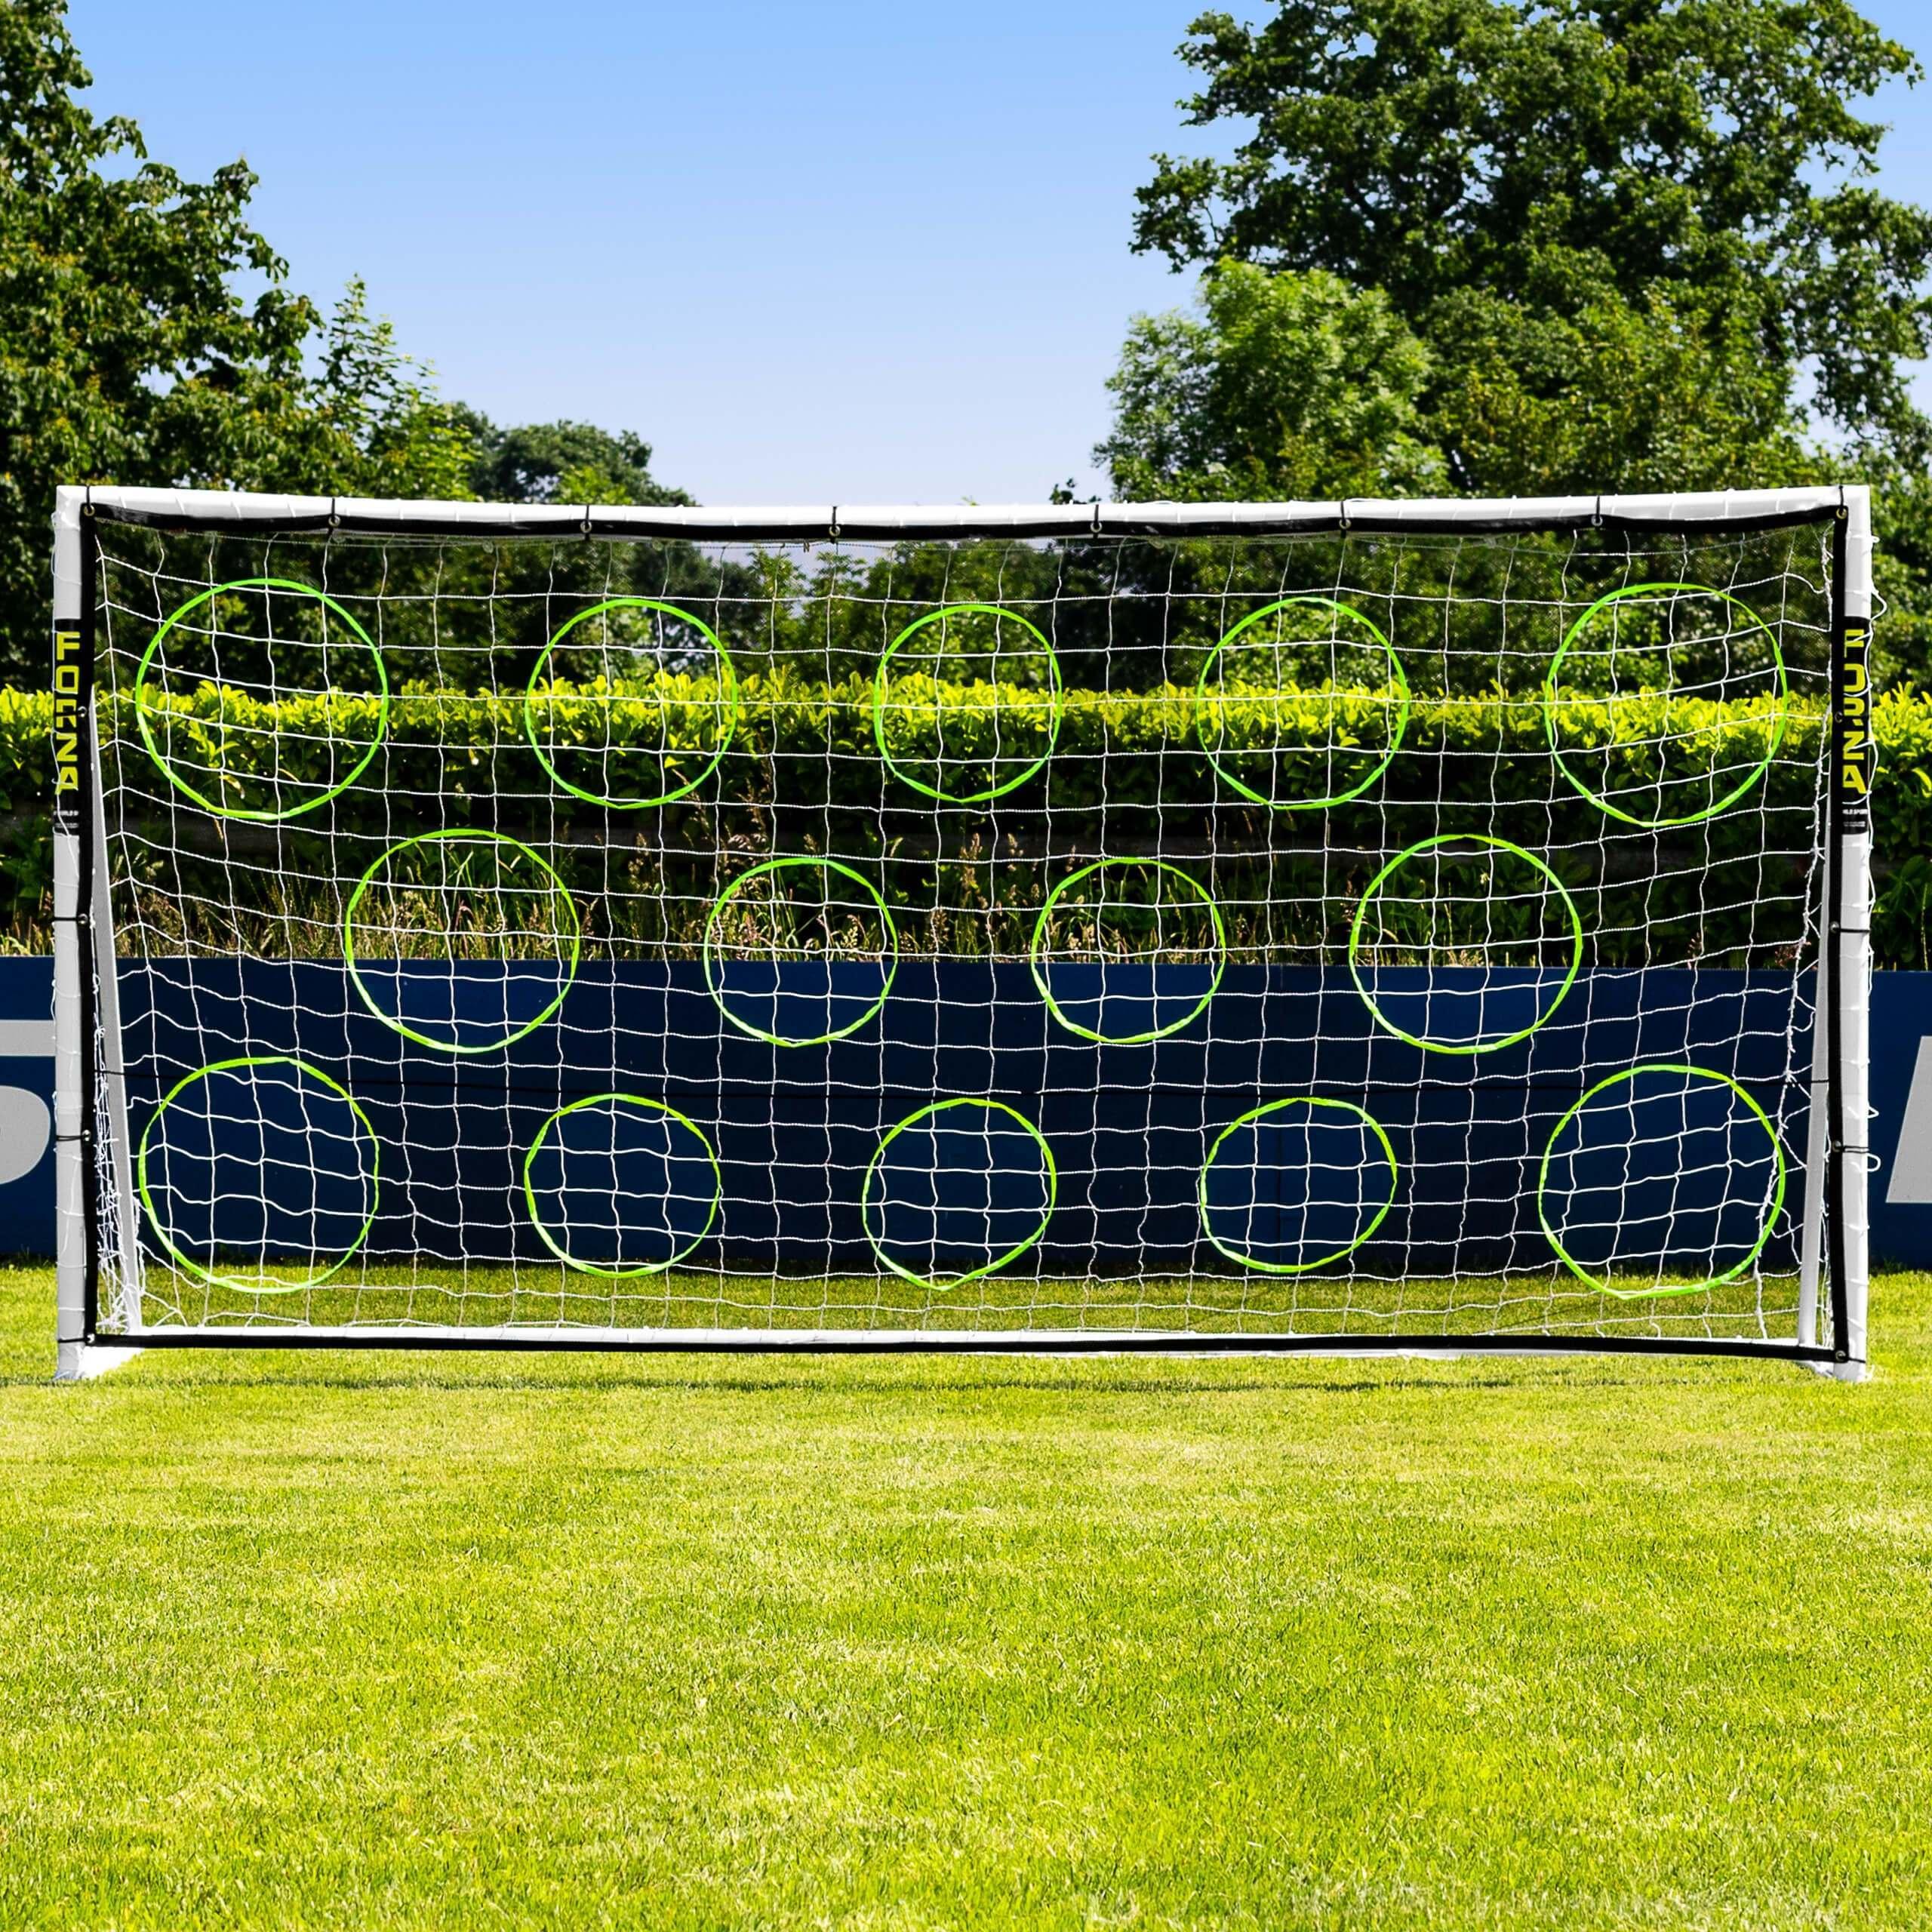 12 x 6 Soccer Goal Target Sheets